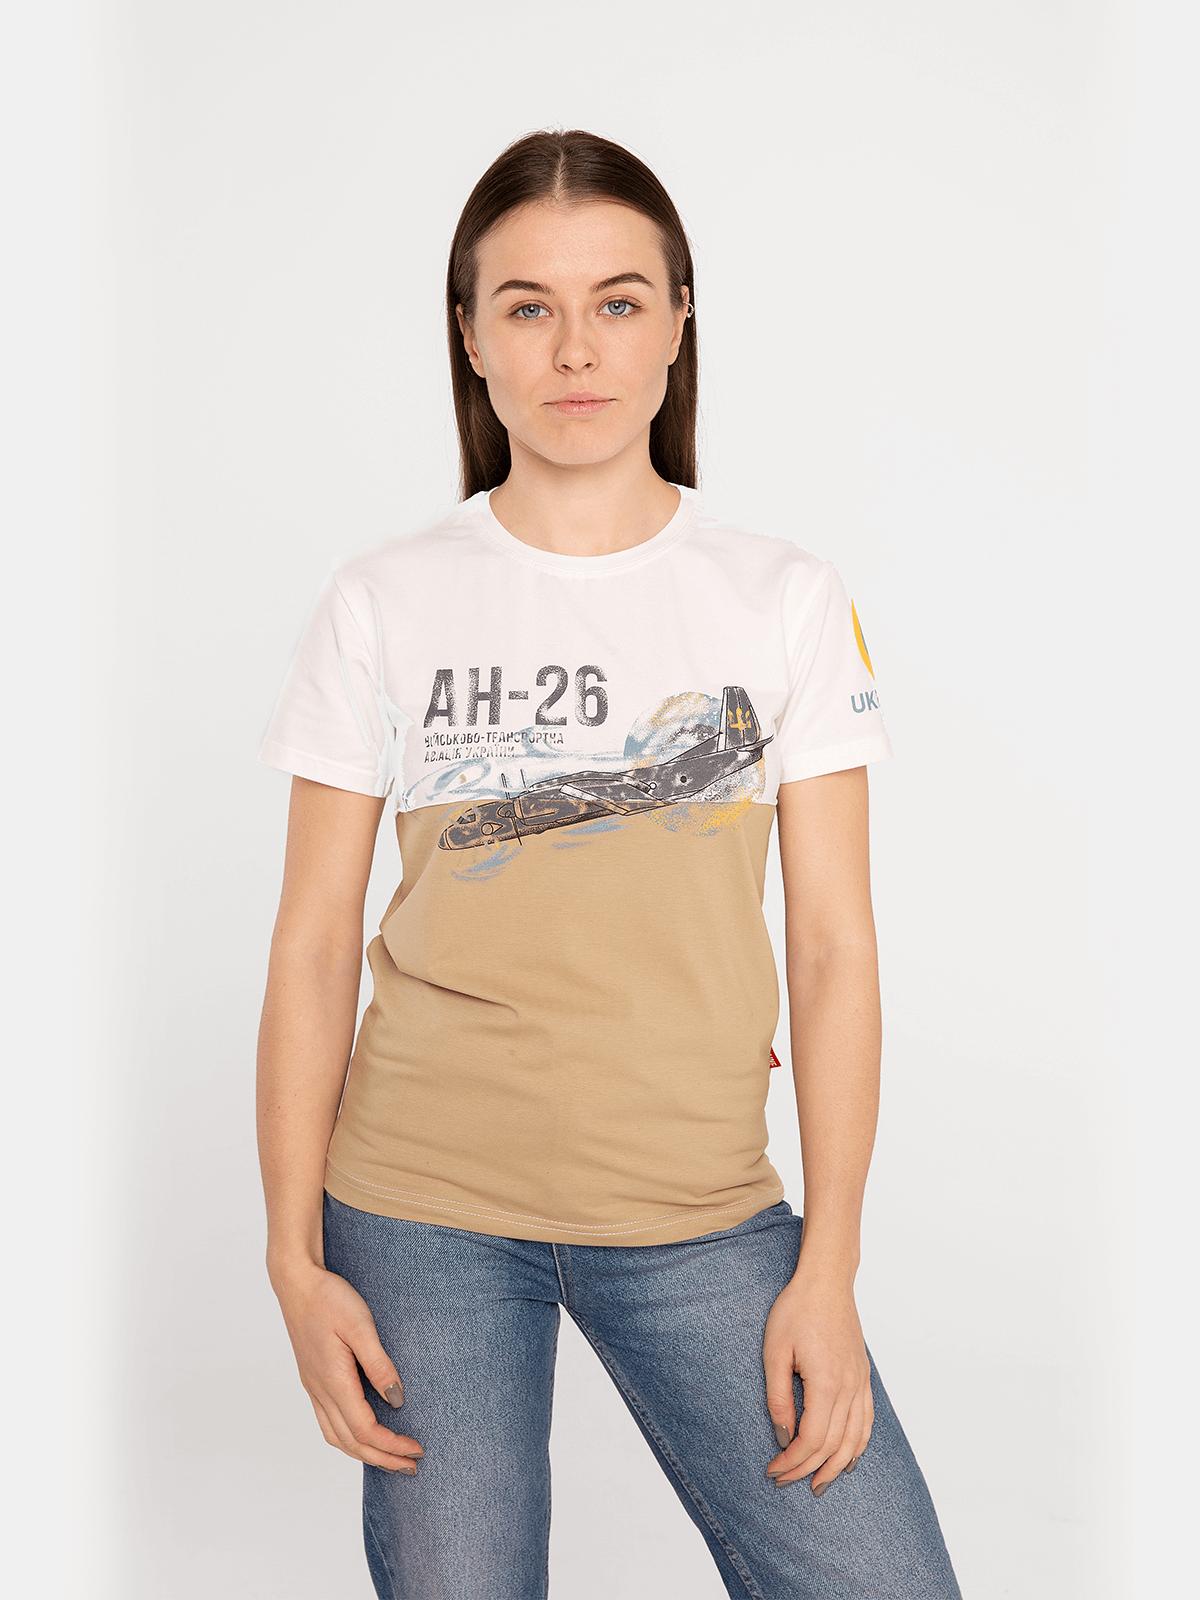 Women's T-Shirt Аn-26. Color sand. Material: 95% cotton, 5% spandex.